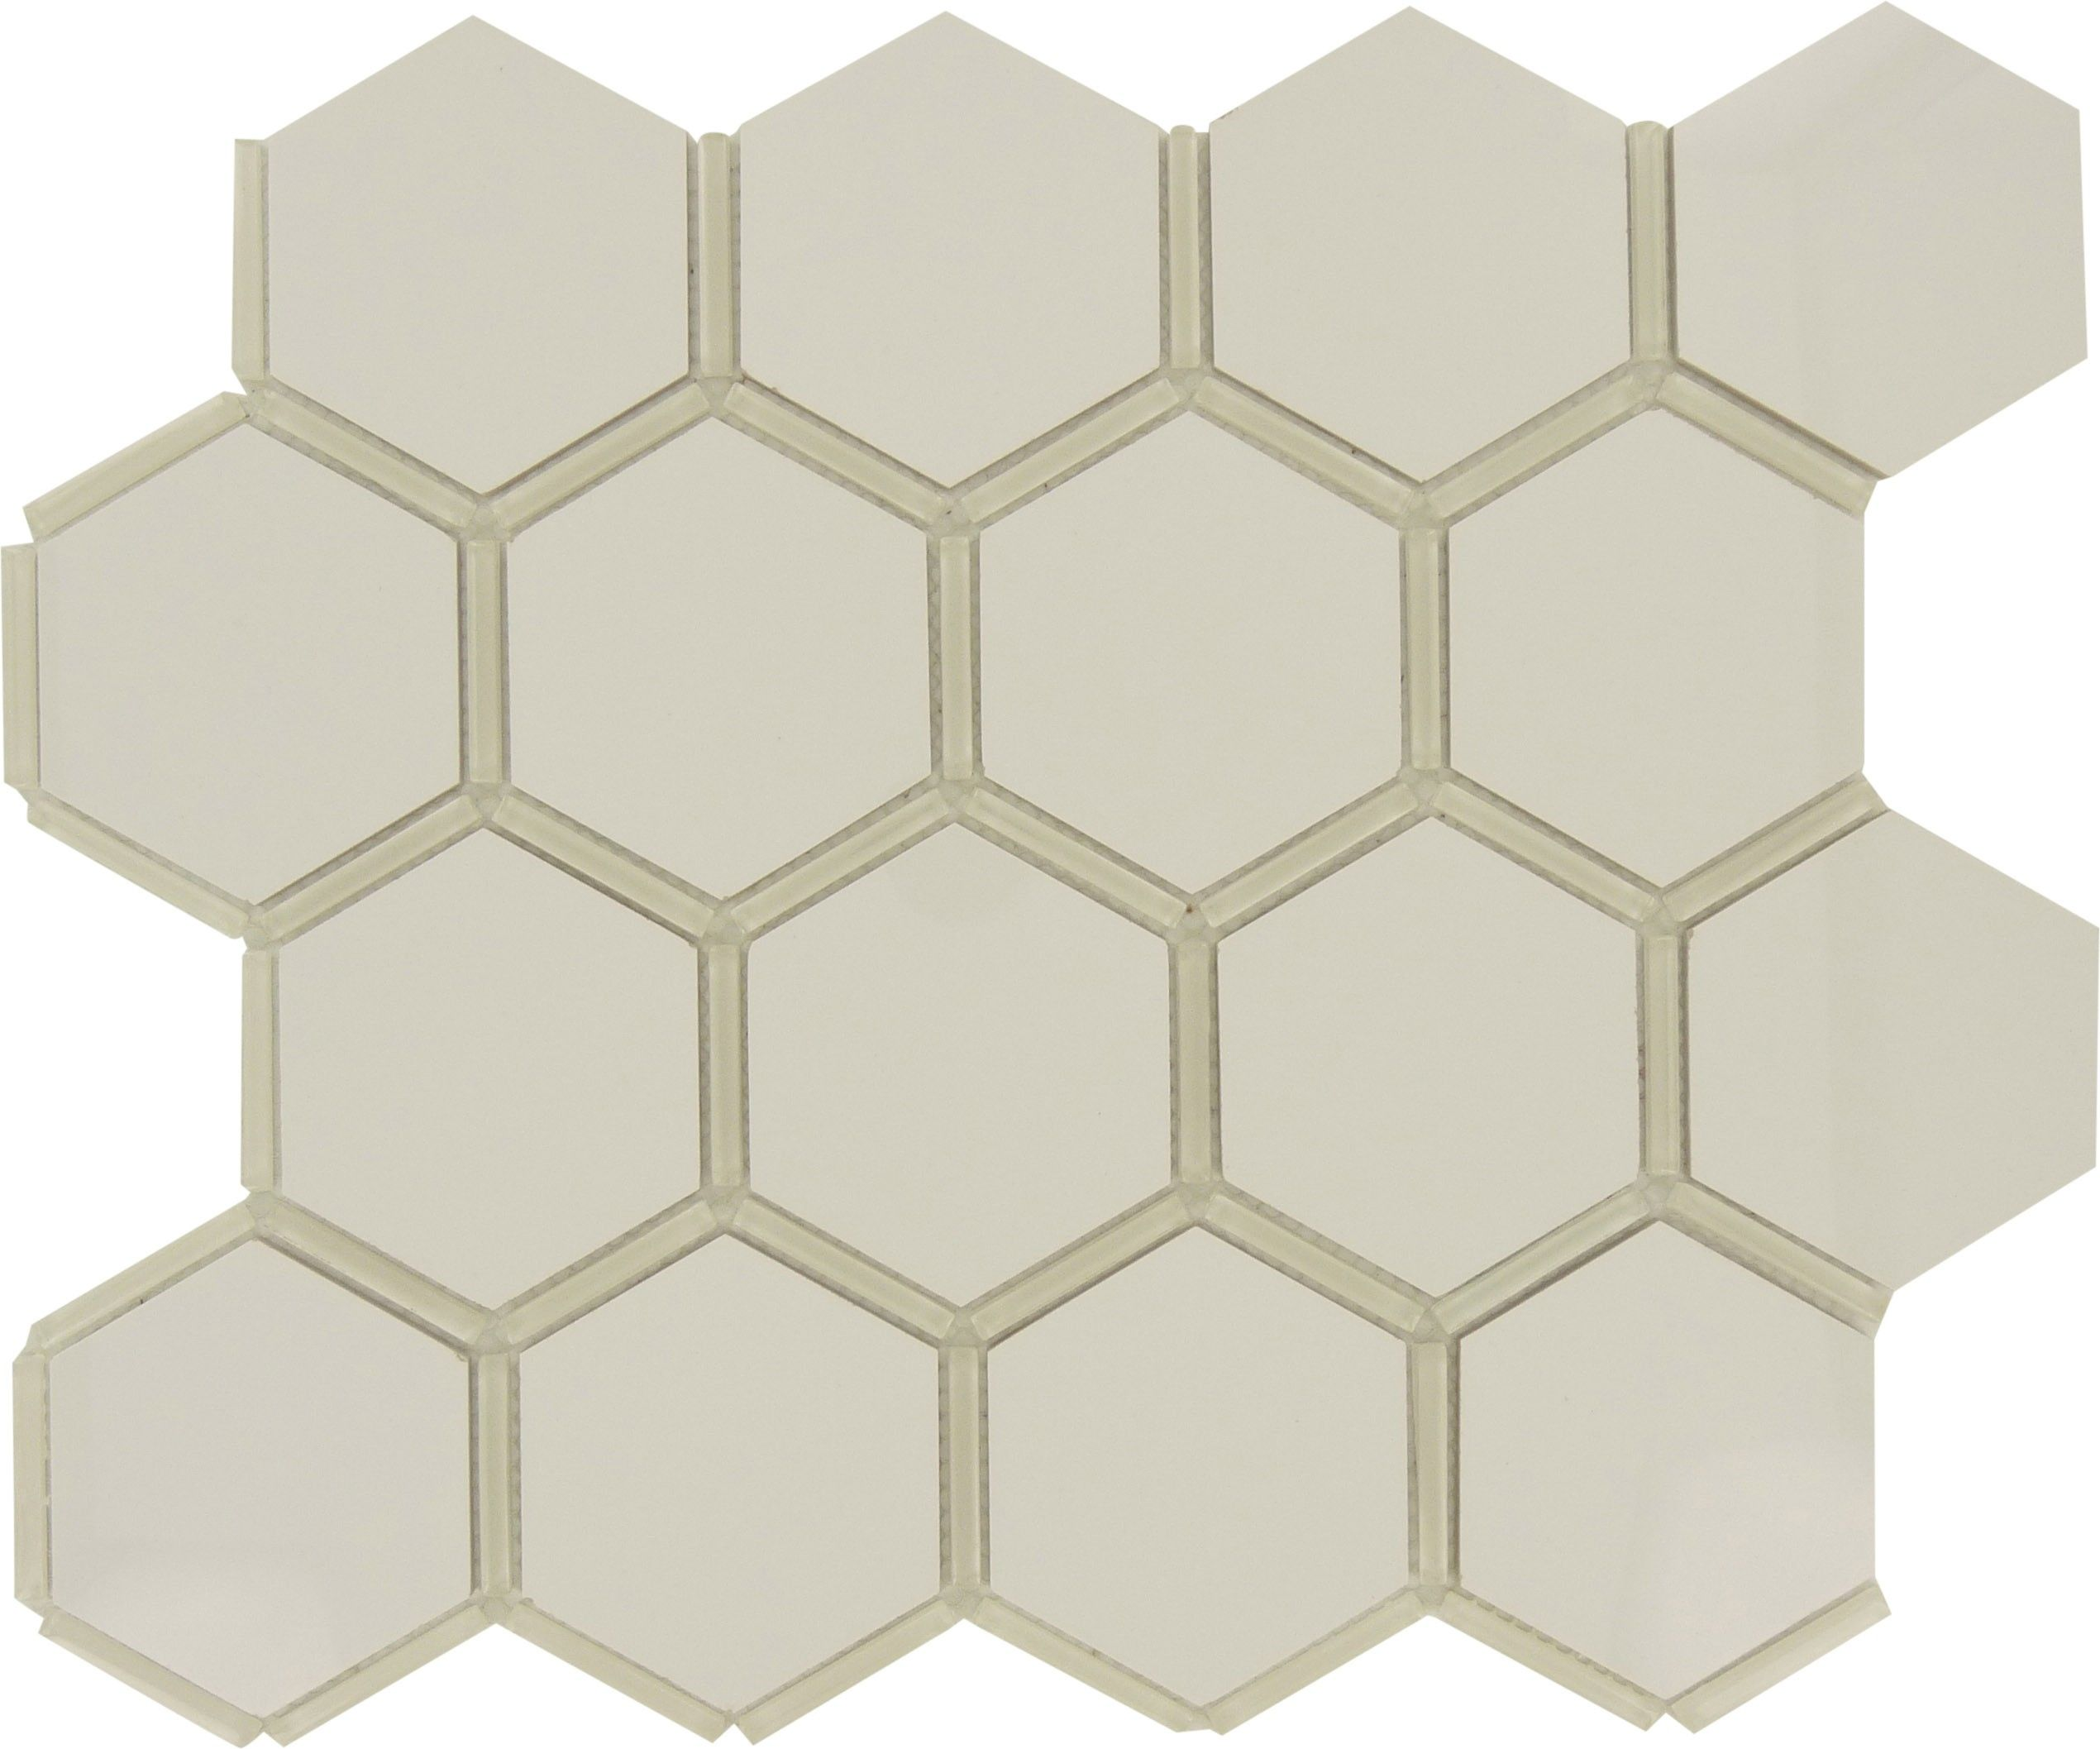 White Glossy And Polished Porcelain Hexagon Tile Hexagon Tiles